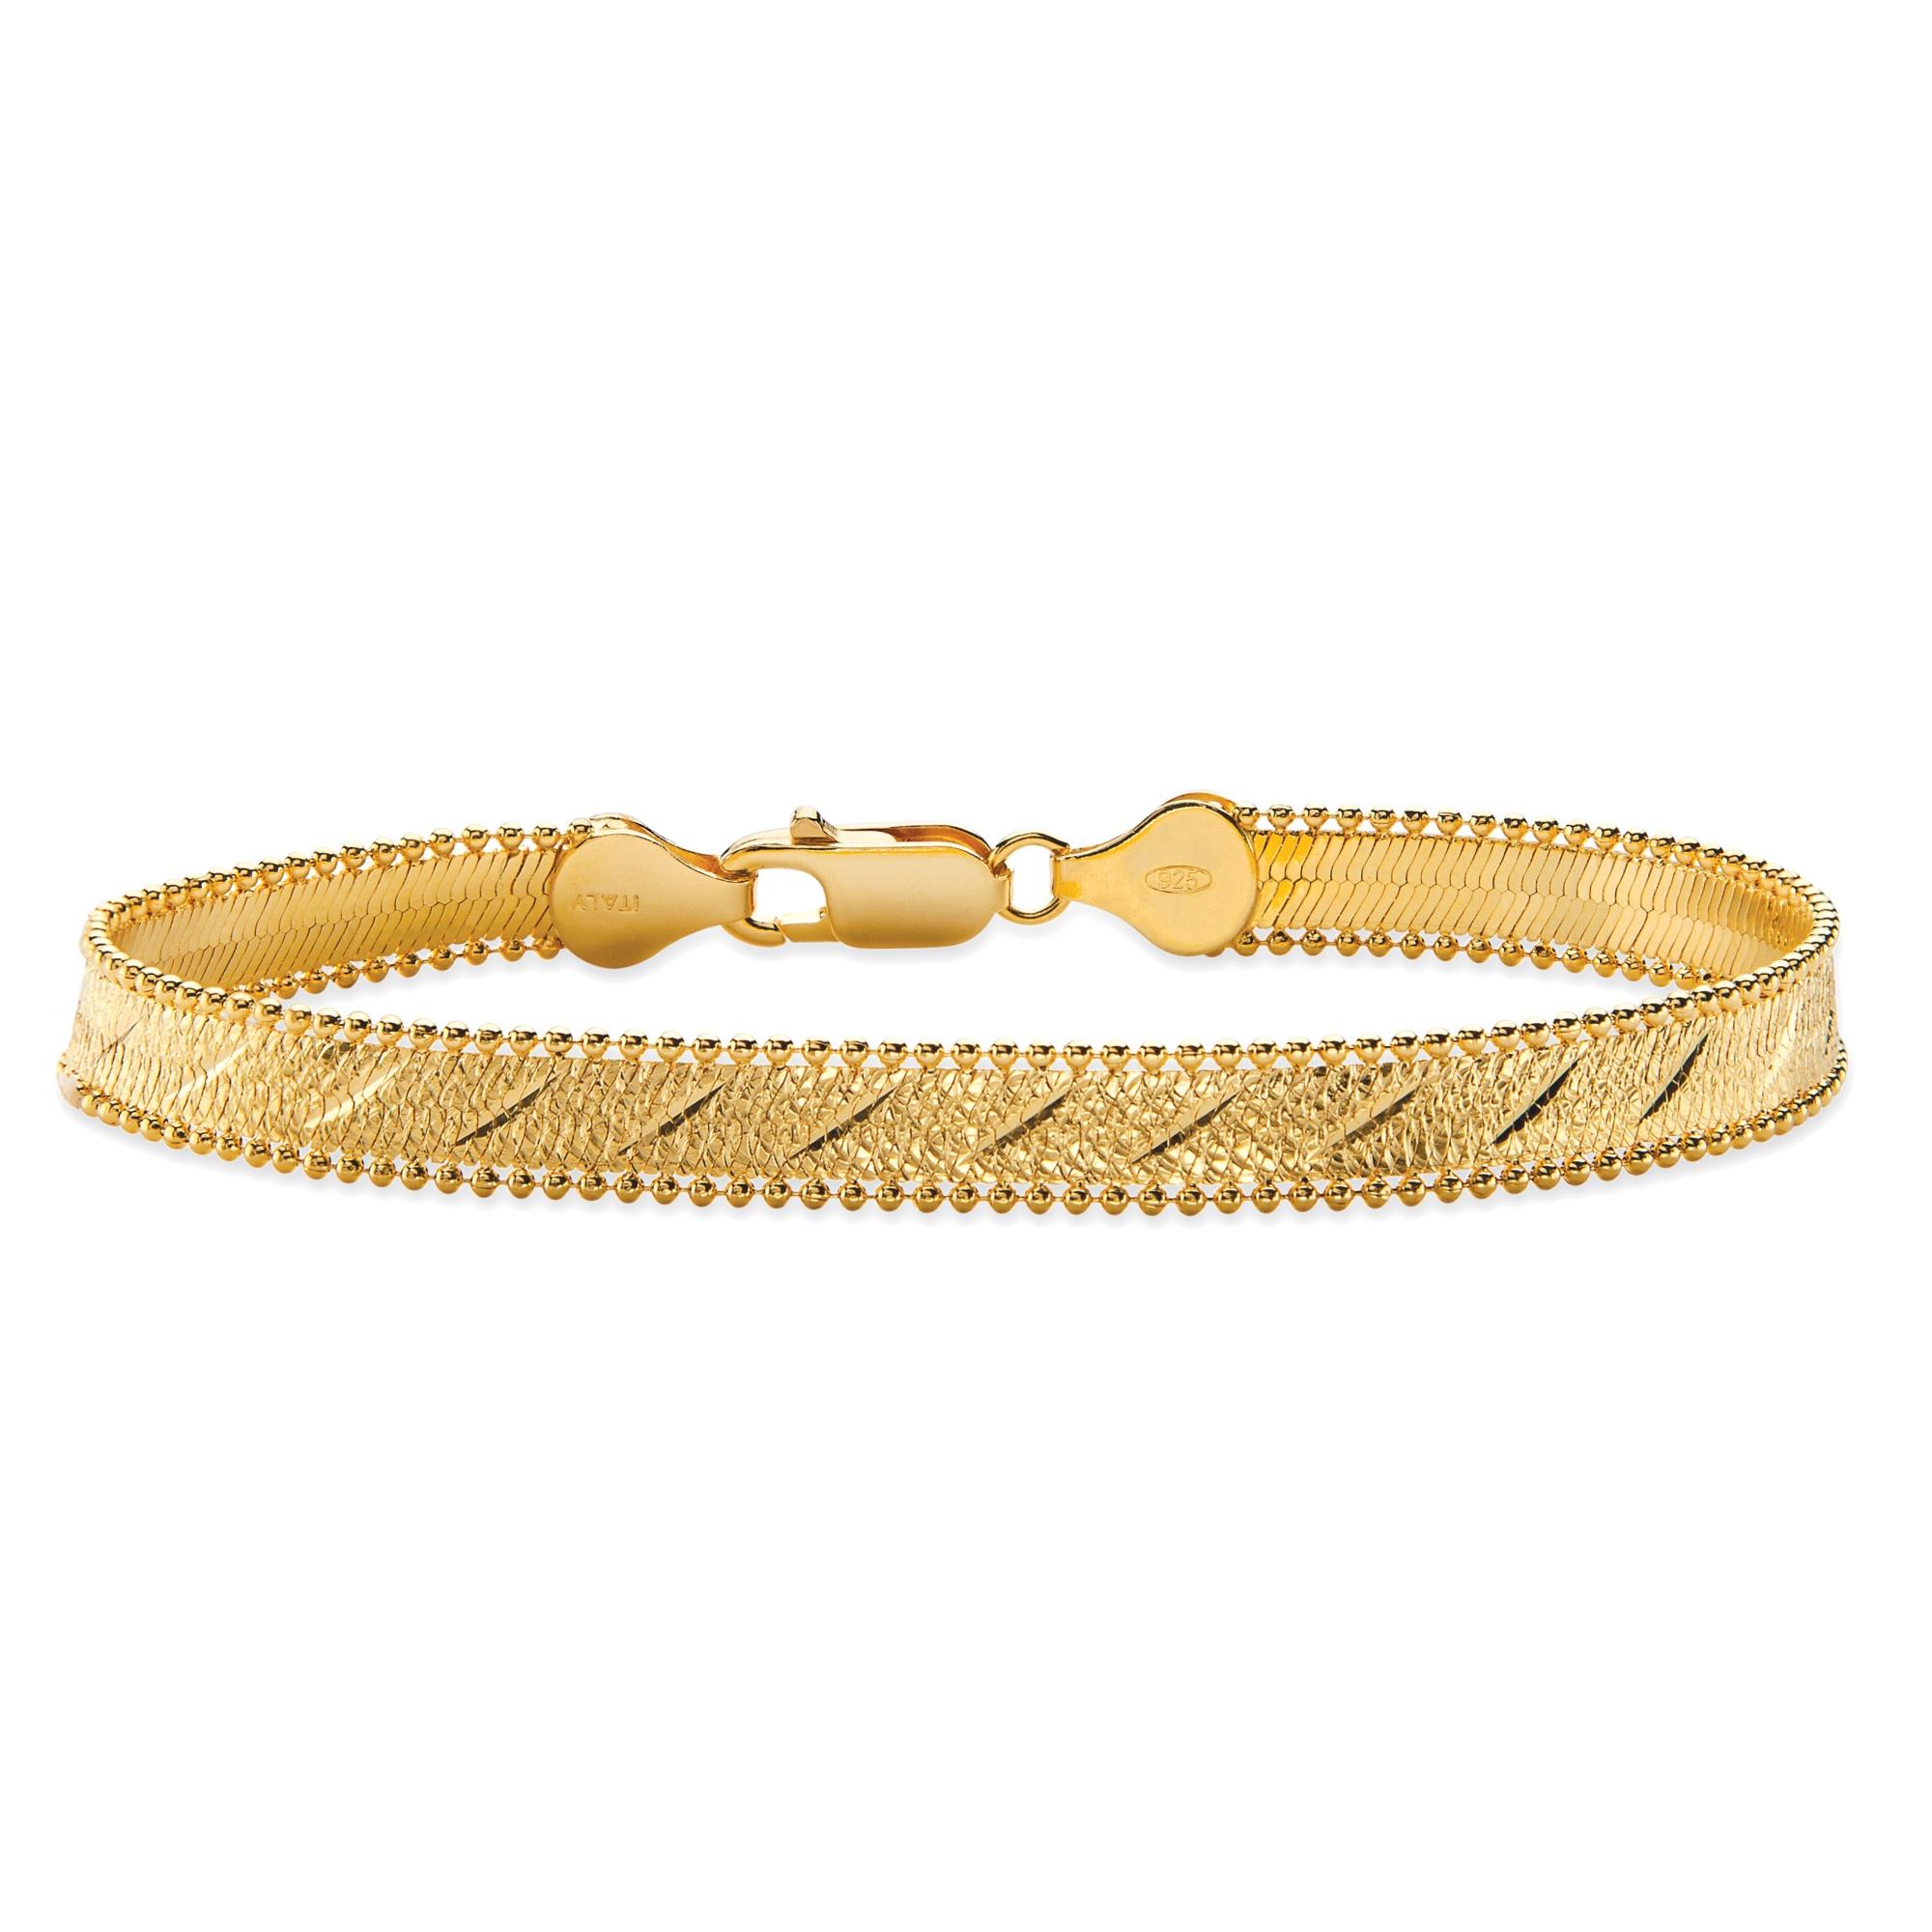 Gold And Silver Bracelets: Diamond-Cut Herringbone Bracelet In 14k Gold Over Sterling